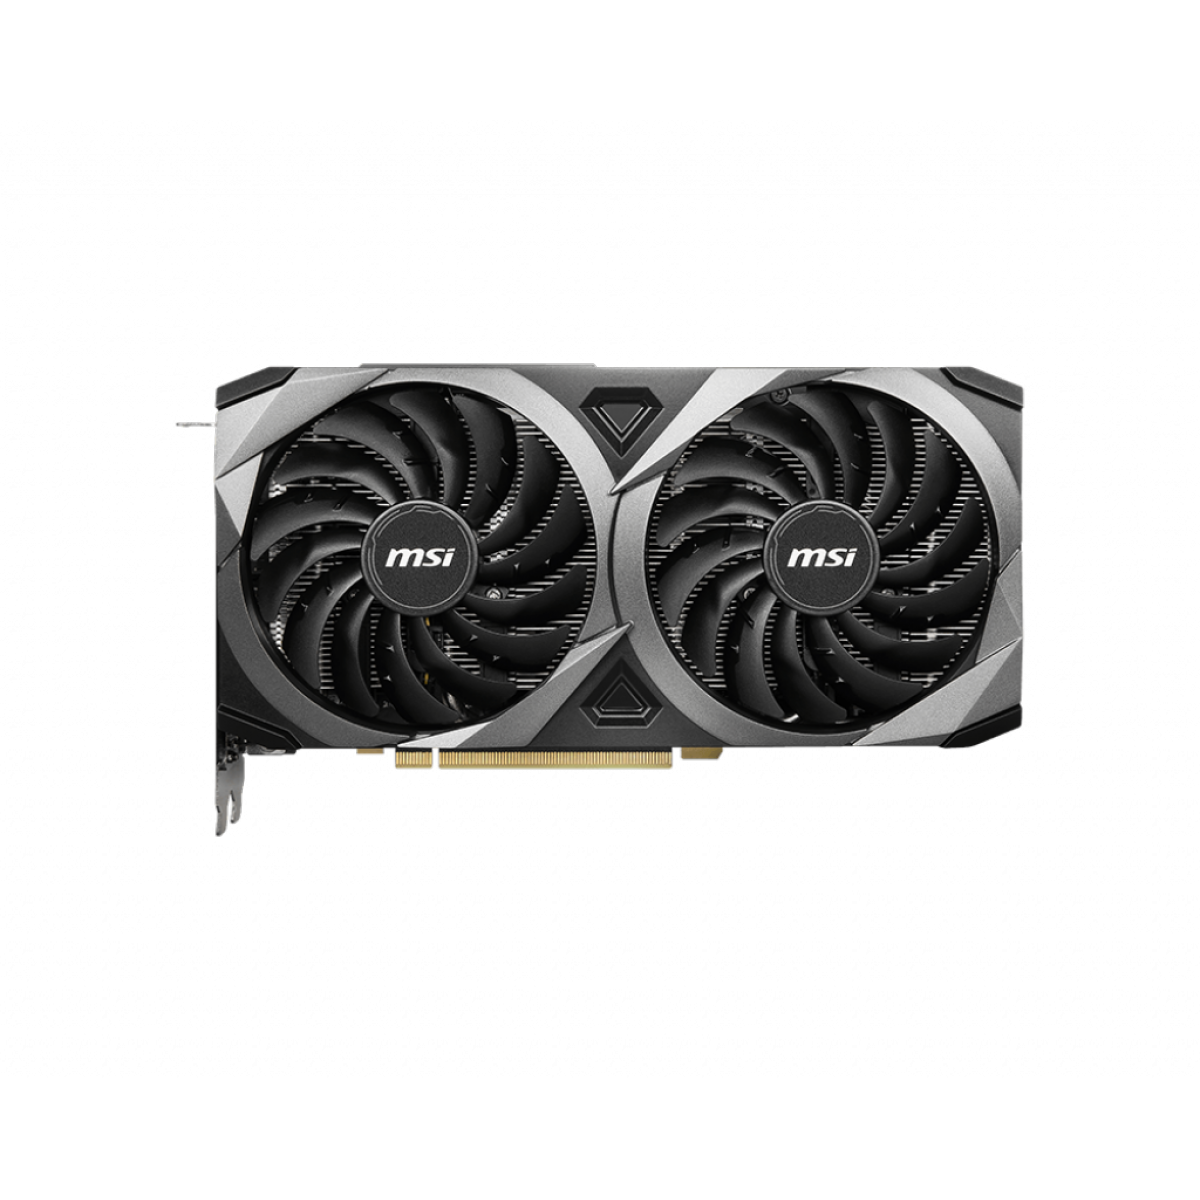 Placa de Vídeo MSI GeForce, RTX 3060 Ti VENTUS 2X OC, 8GB GDDR6, 256Bit